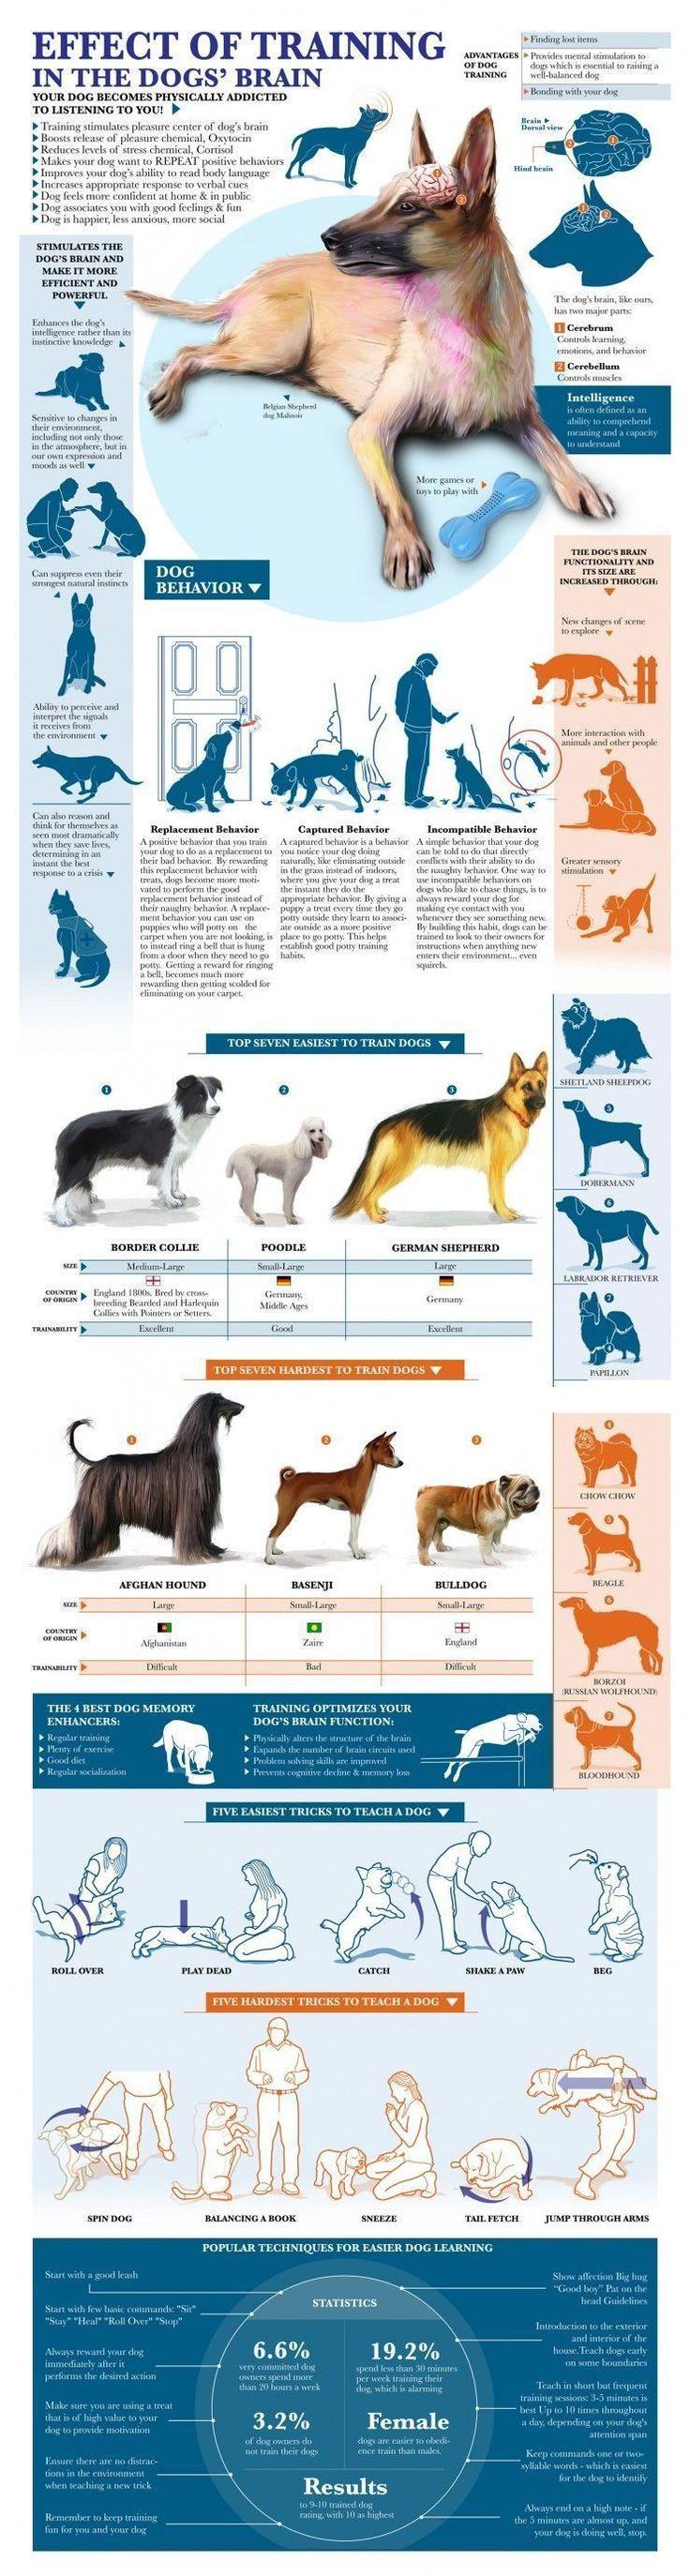 You should definitely check out my website for amazing tips on dog training at bestfordogtraining.com #dogtipsandtricks #BigDog #DogCare